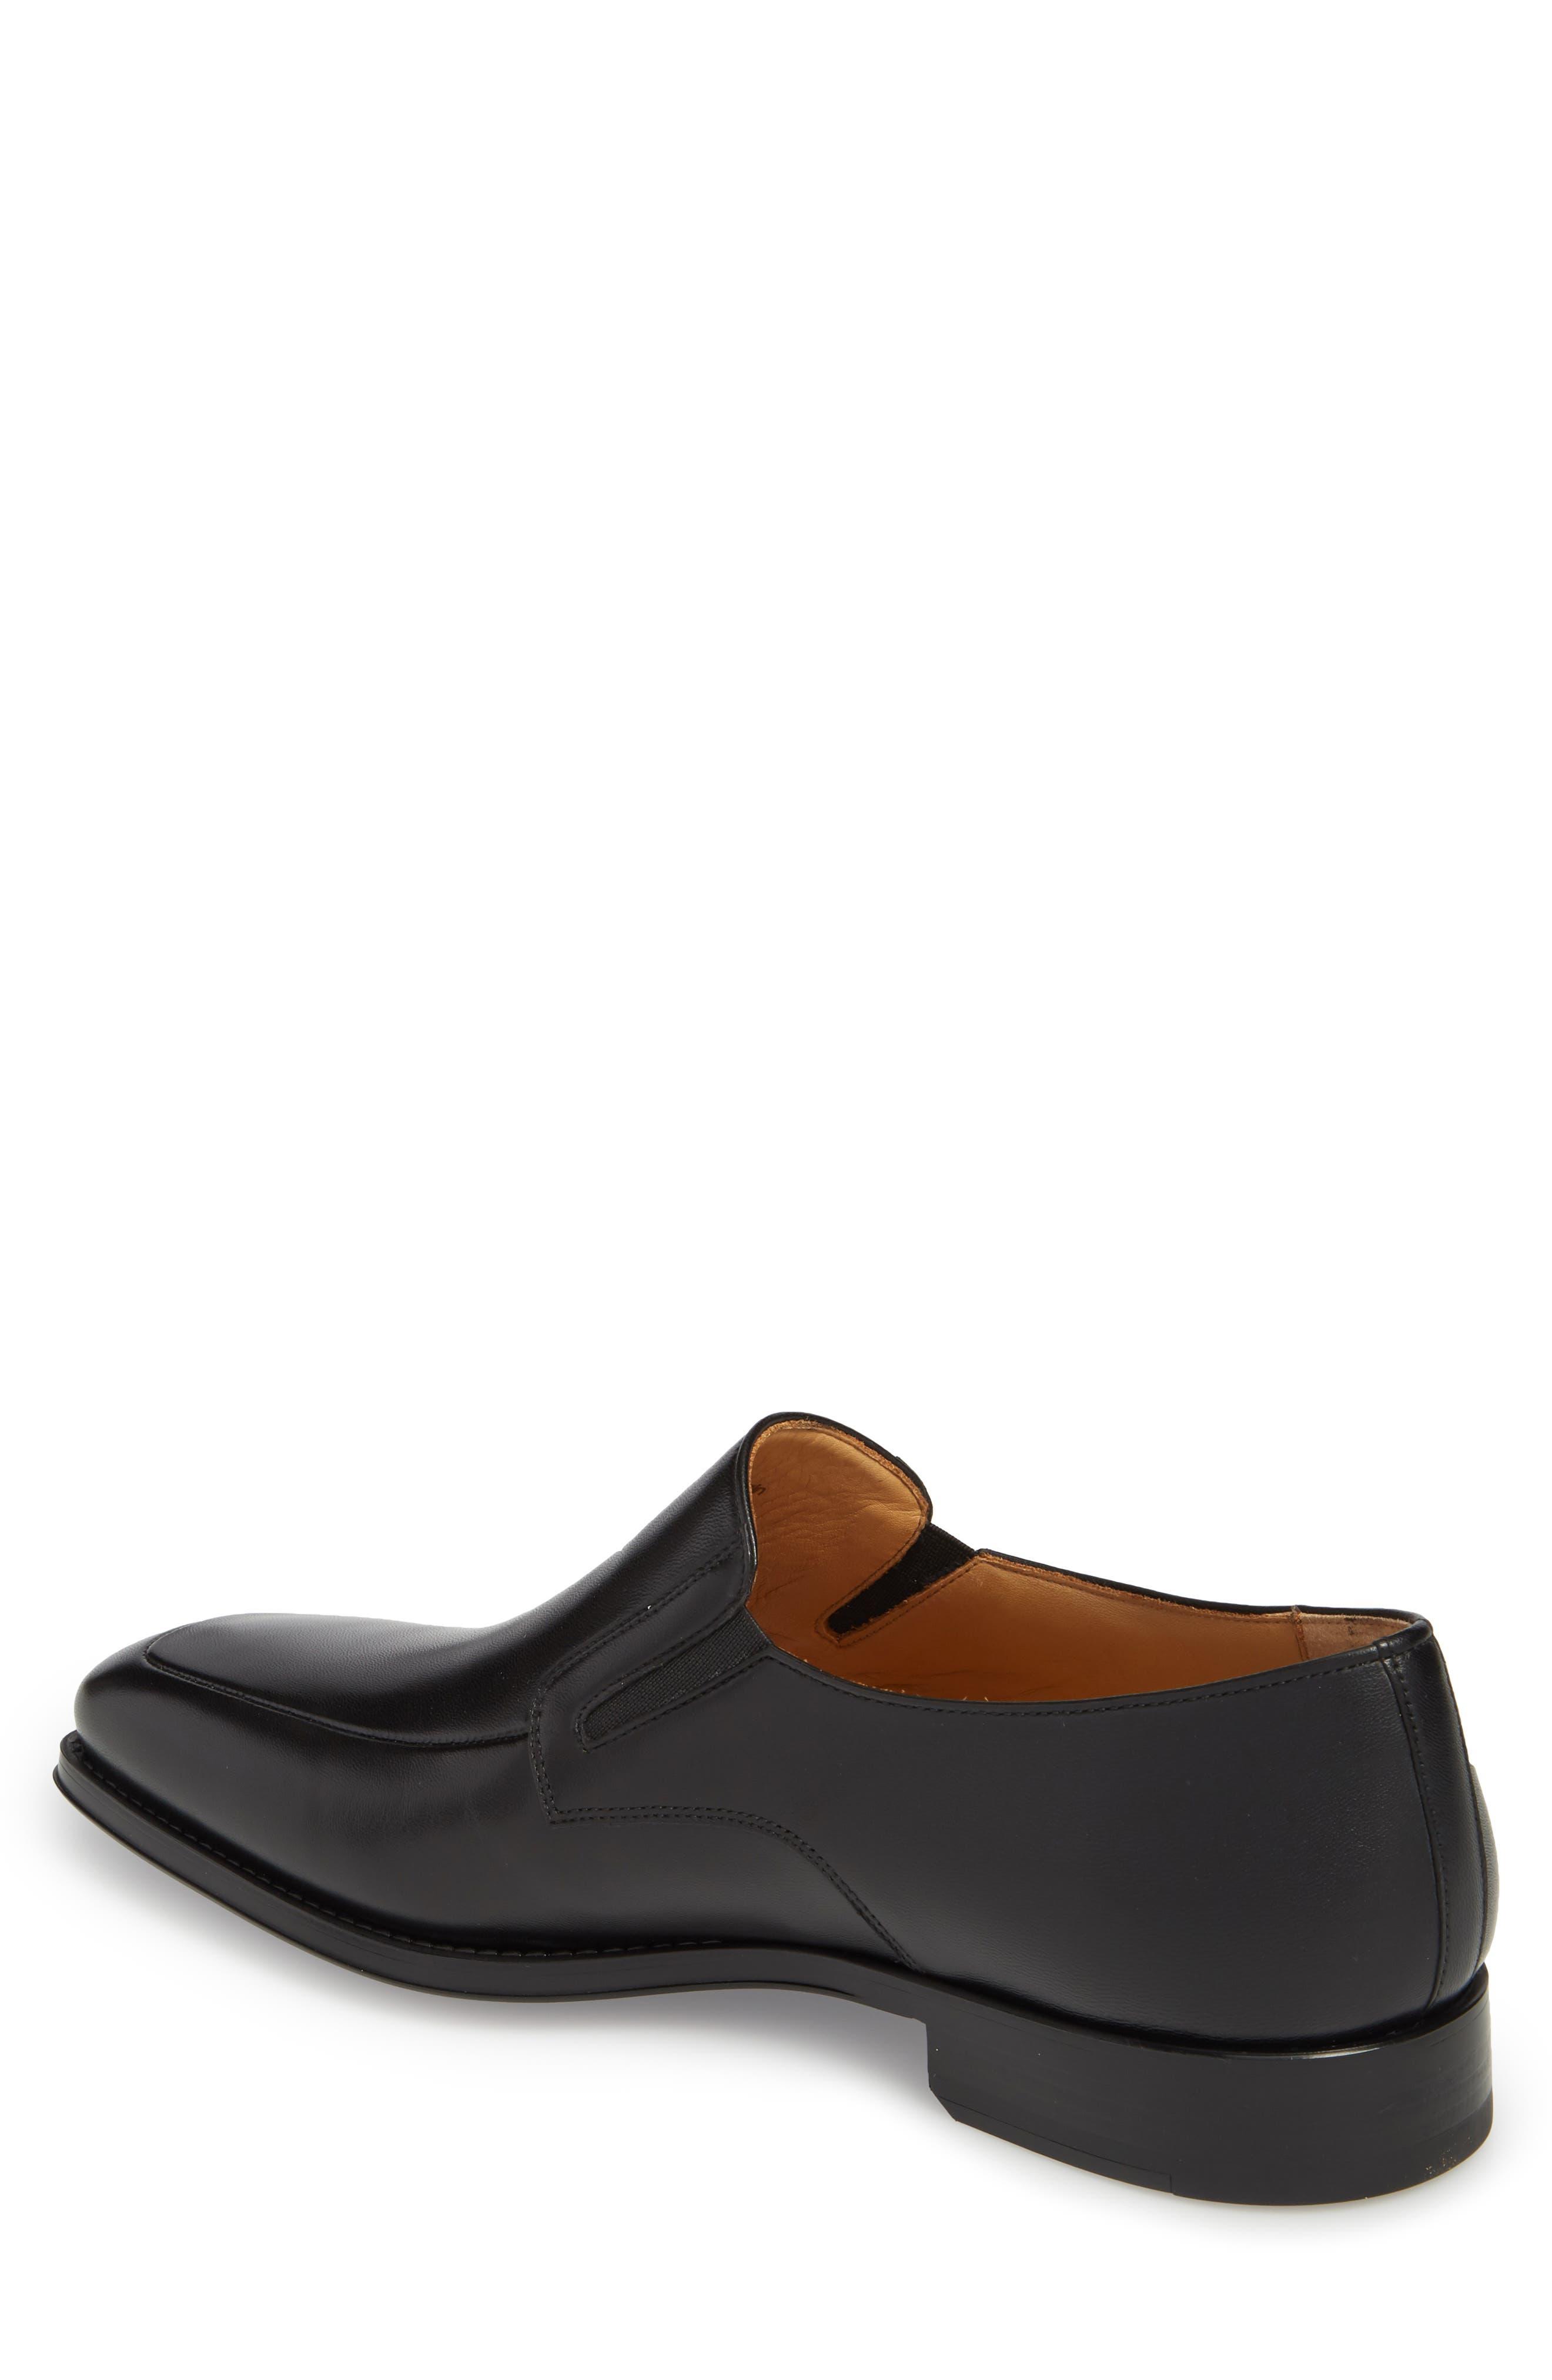 Fabricio Apron Toe Slip-On,                             Alternate thumbnail 2, color,                             Black Leather